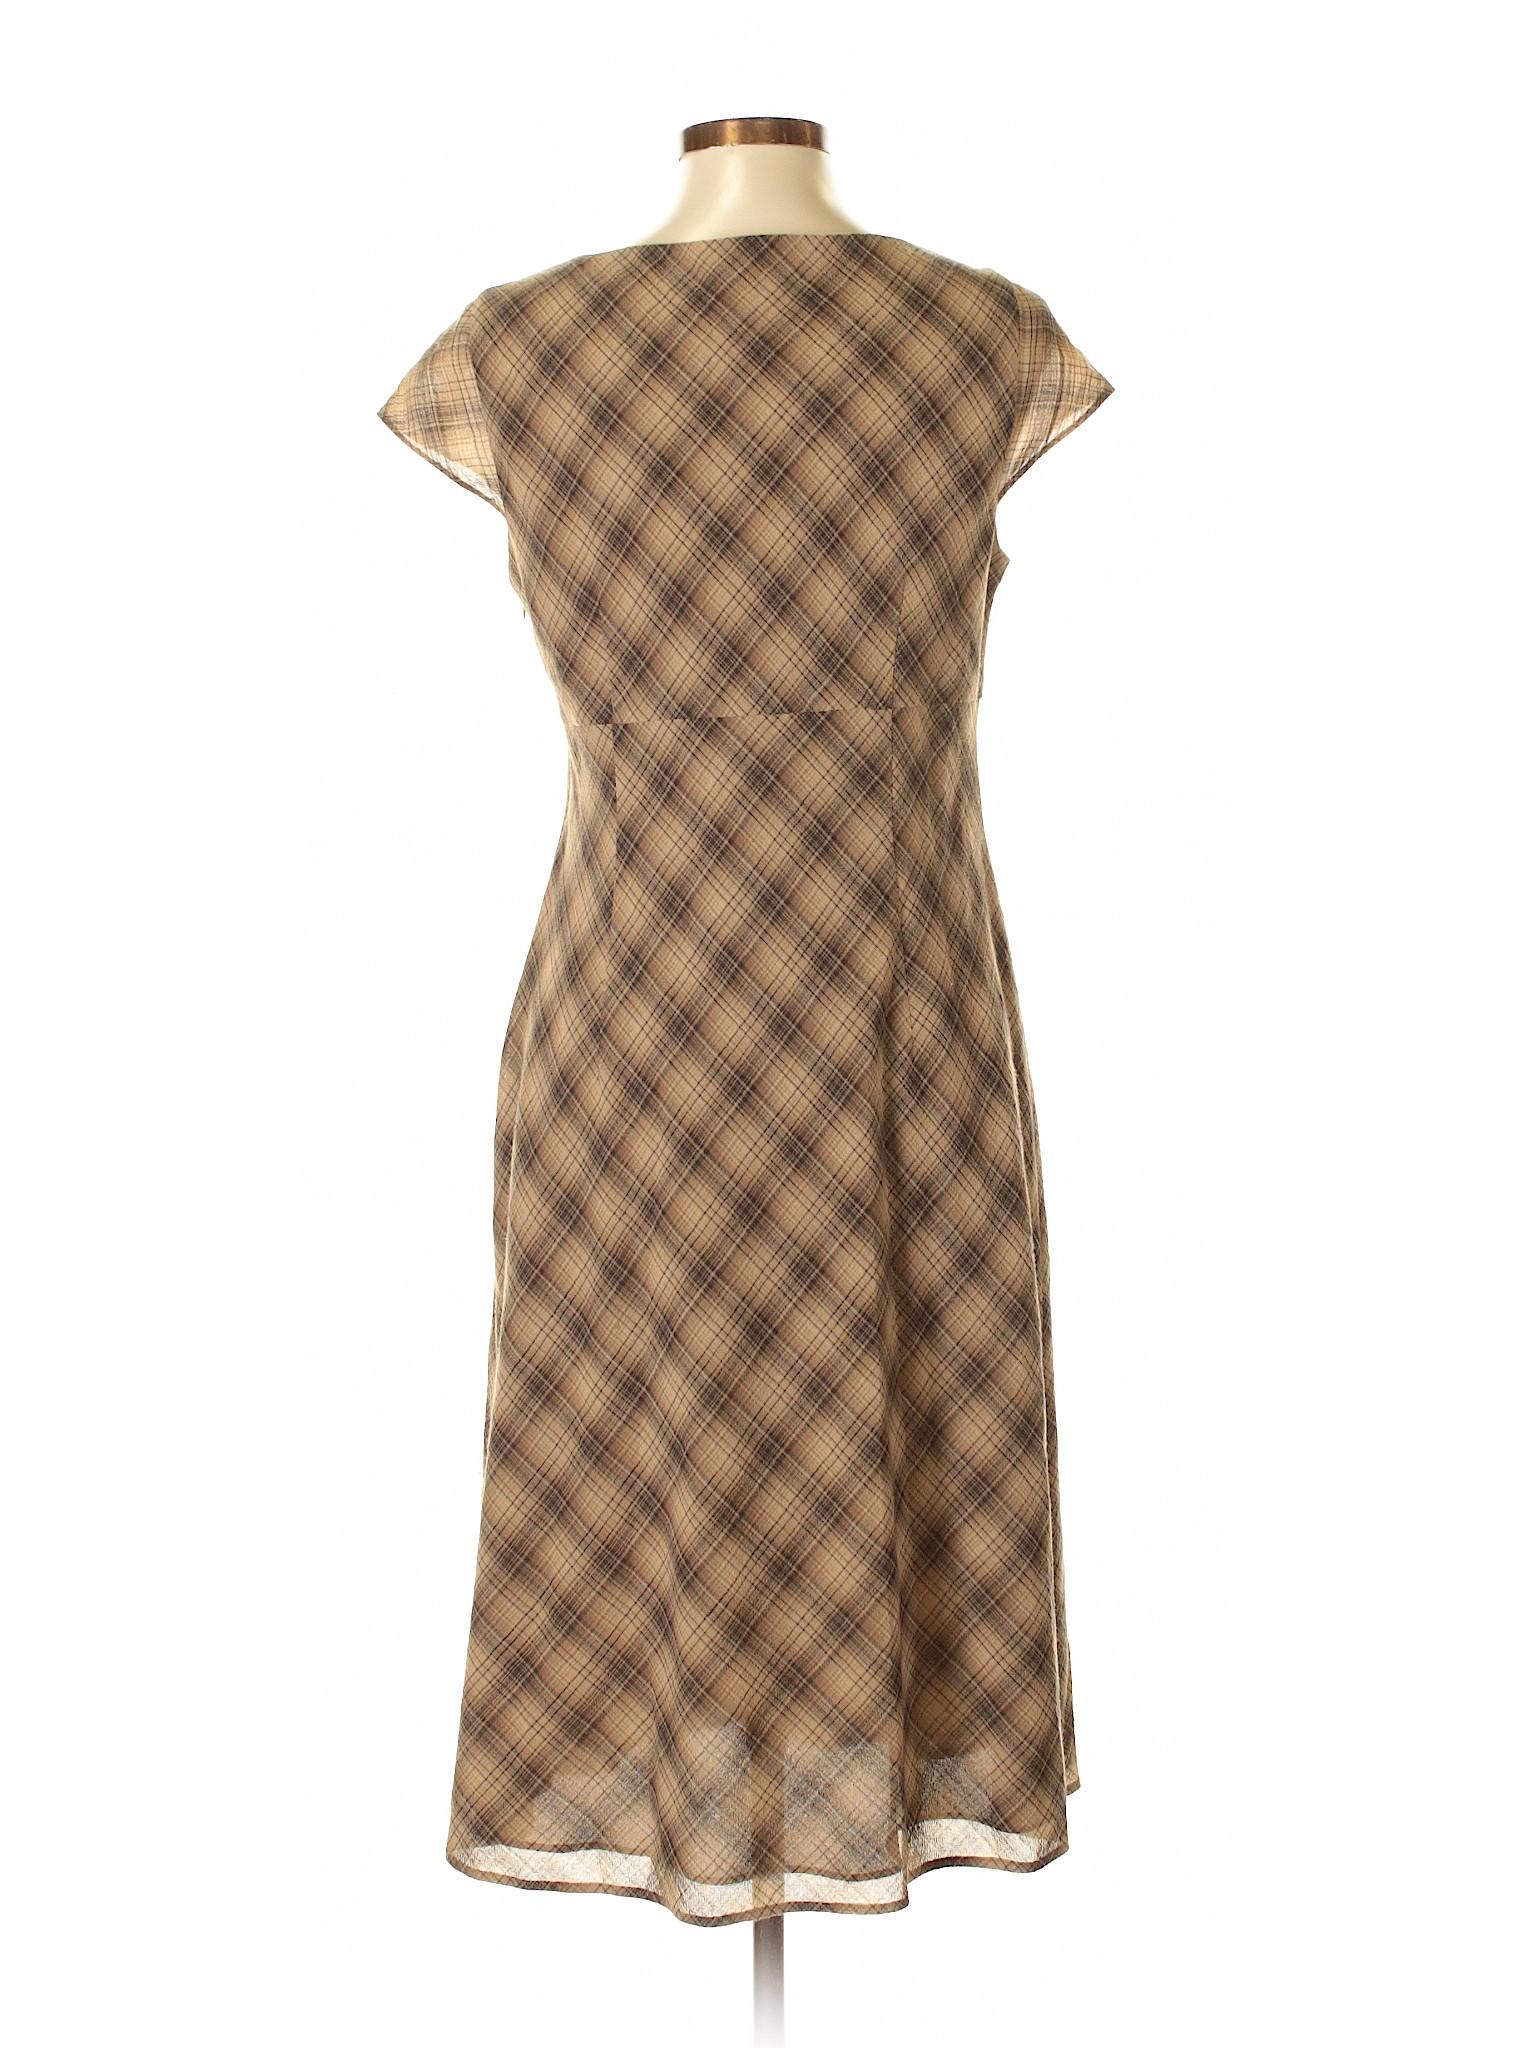 Dress Ann winter LOFT Boutique Casual Taylor OSwTRRqvx